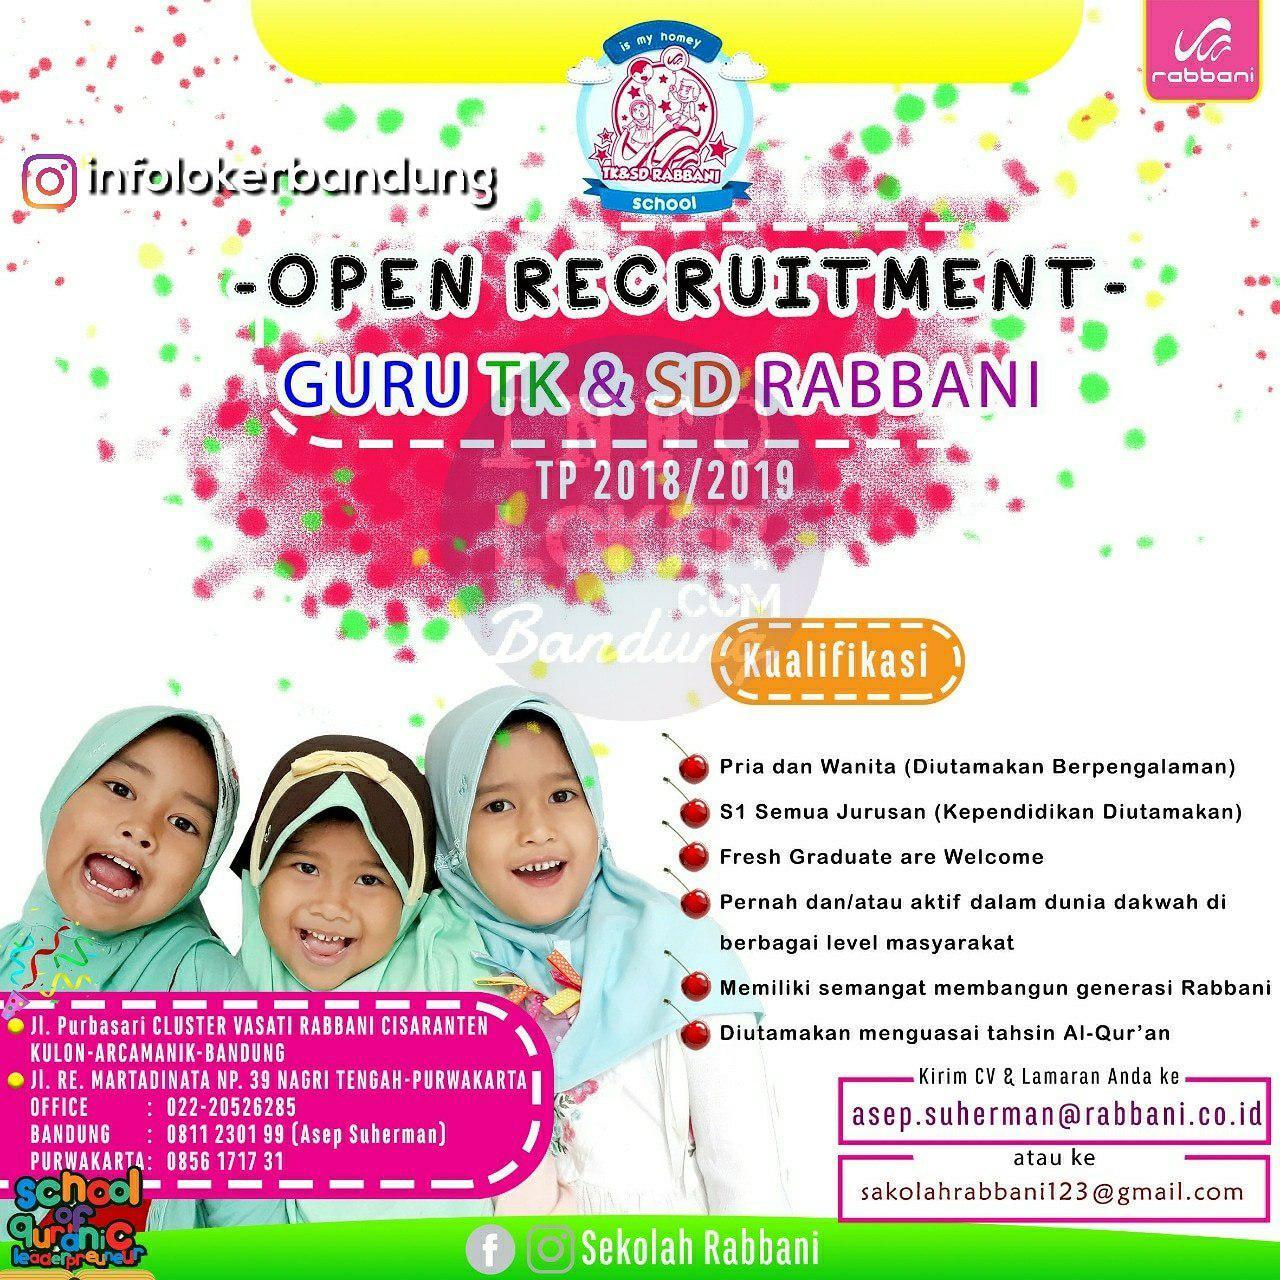 Lowongan Kerja Sekolah Rabbani Bandung April 2018